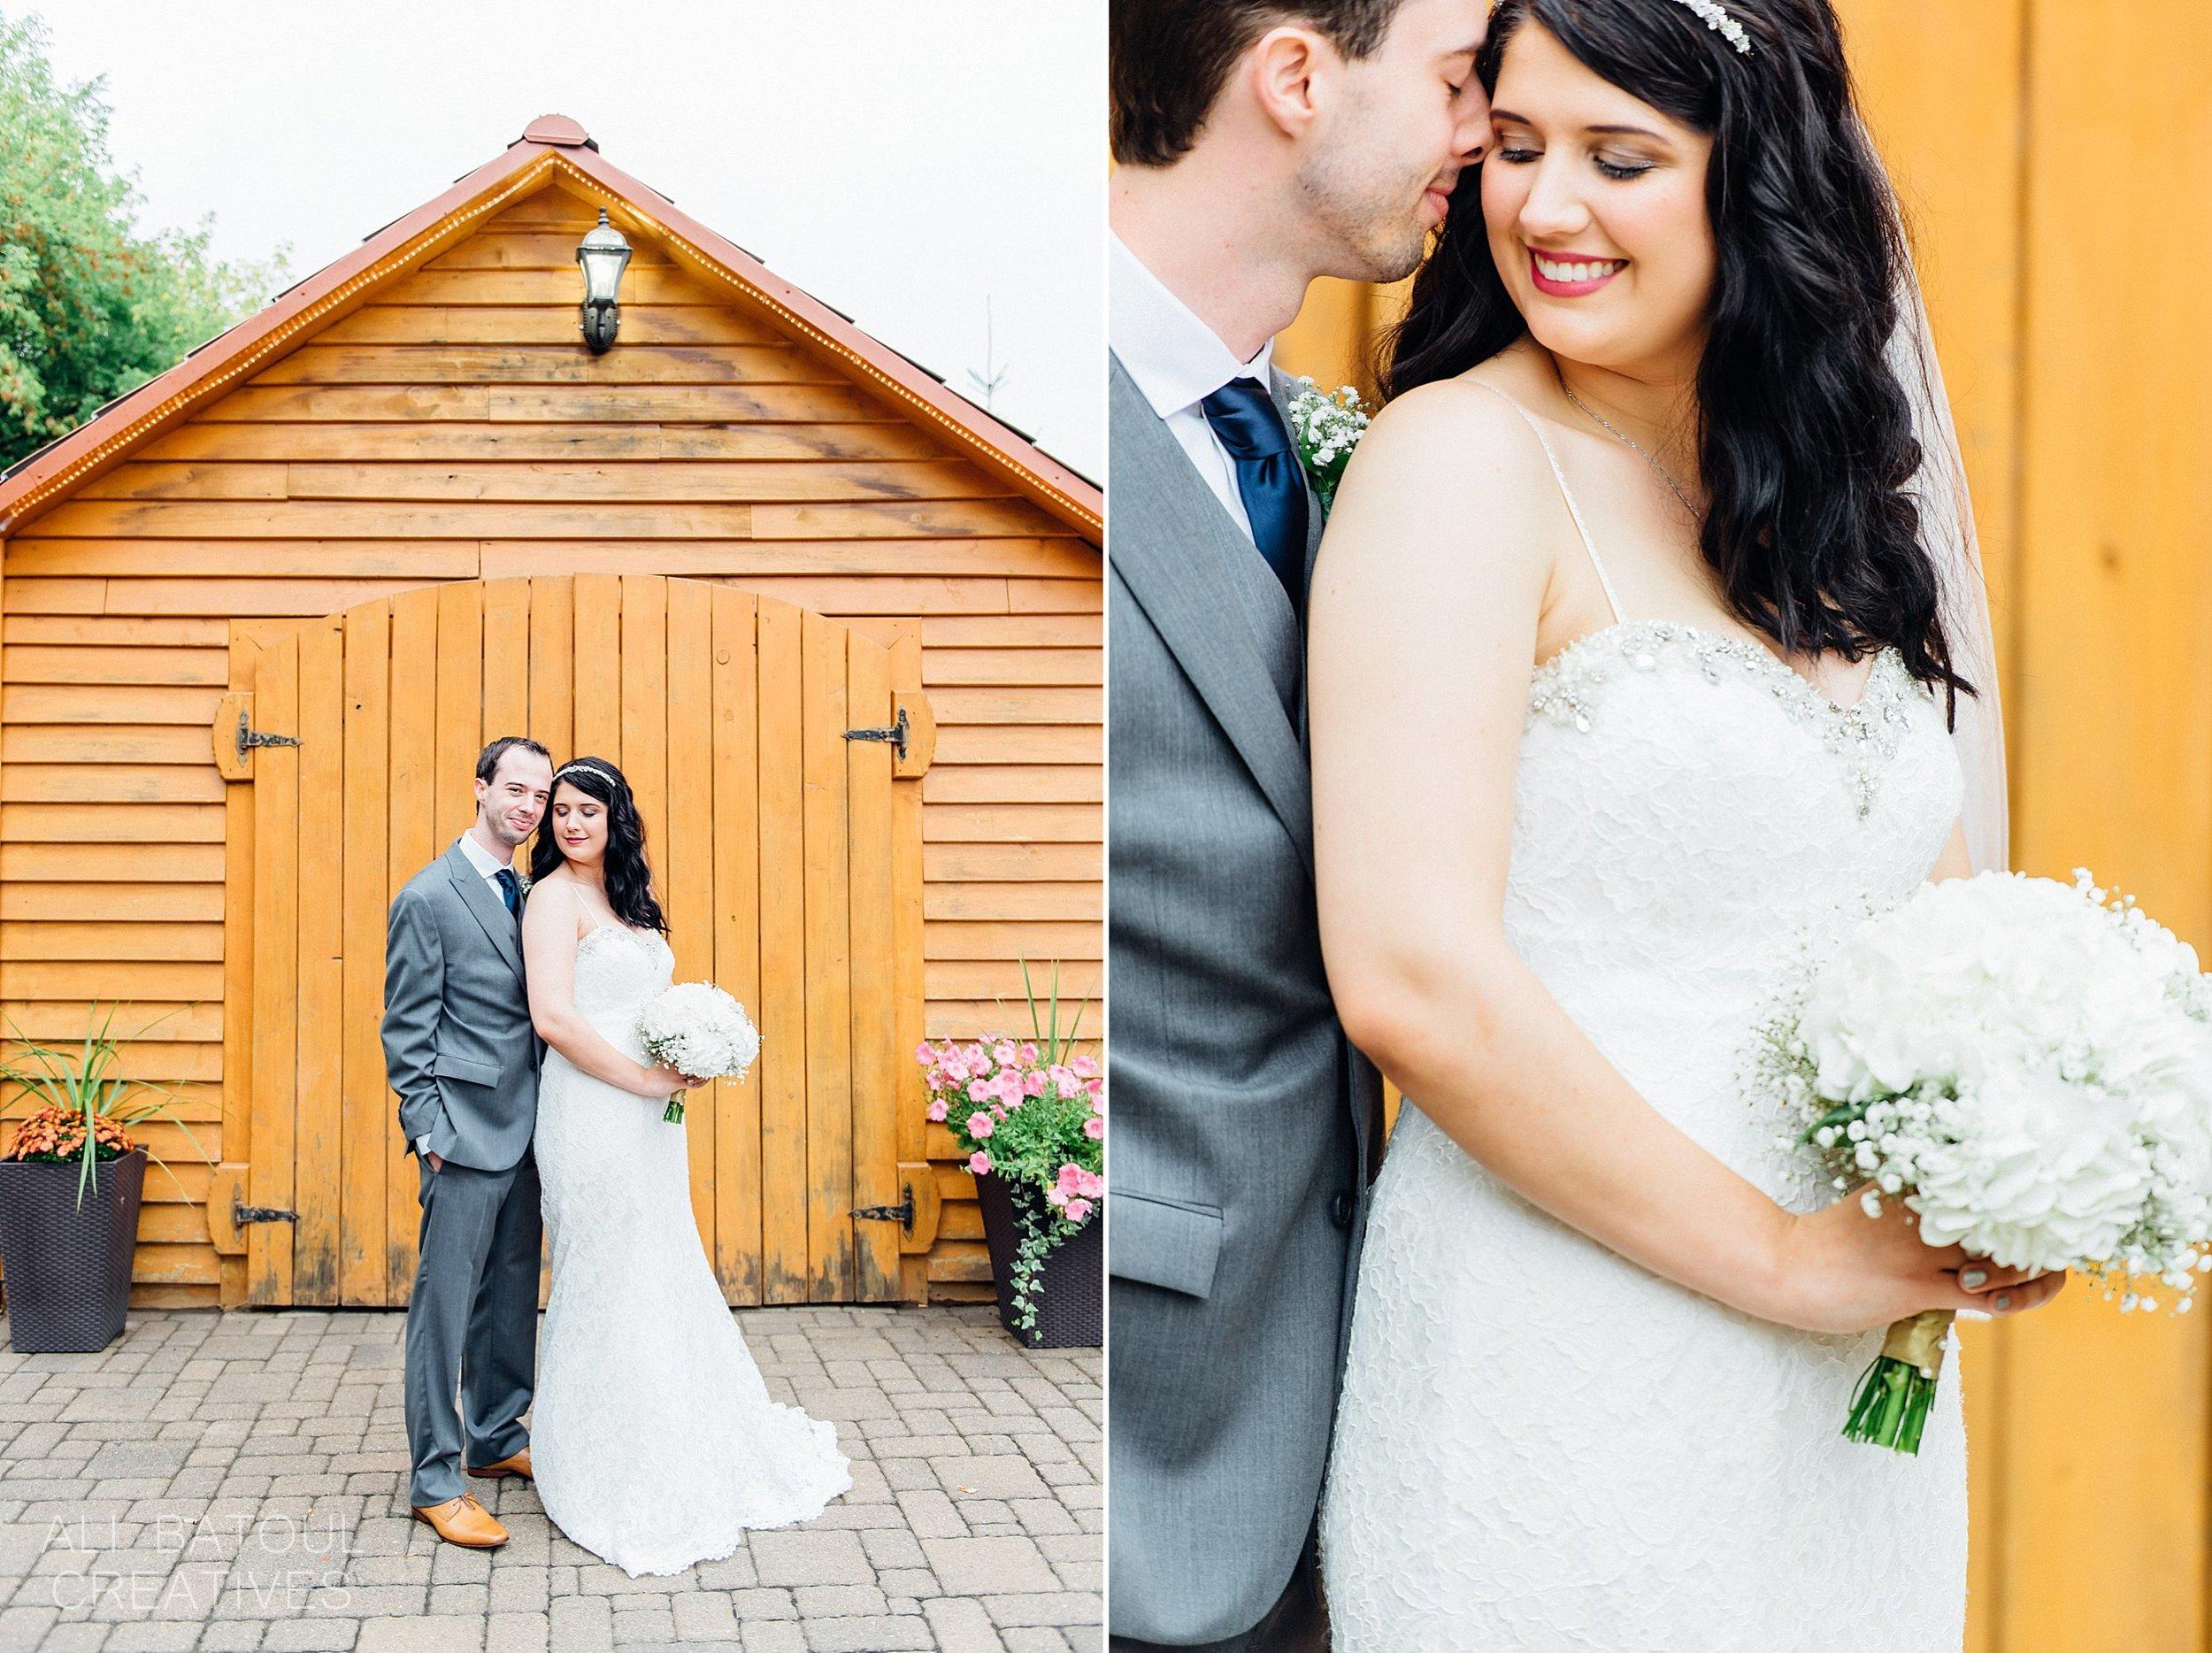 Jocelyn + Steve At The Schoolhouse Wedding - Ali and Batoul Fine Art Wedding Photography_0040.jpg